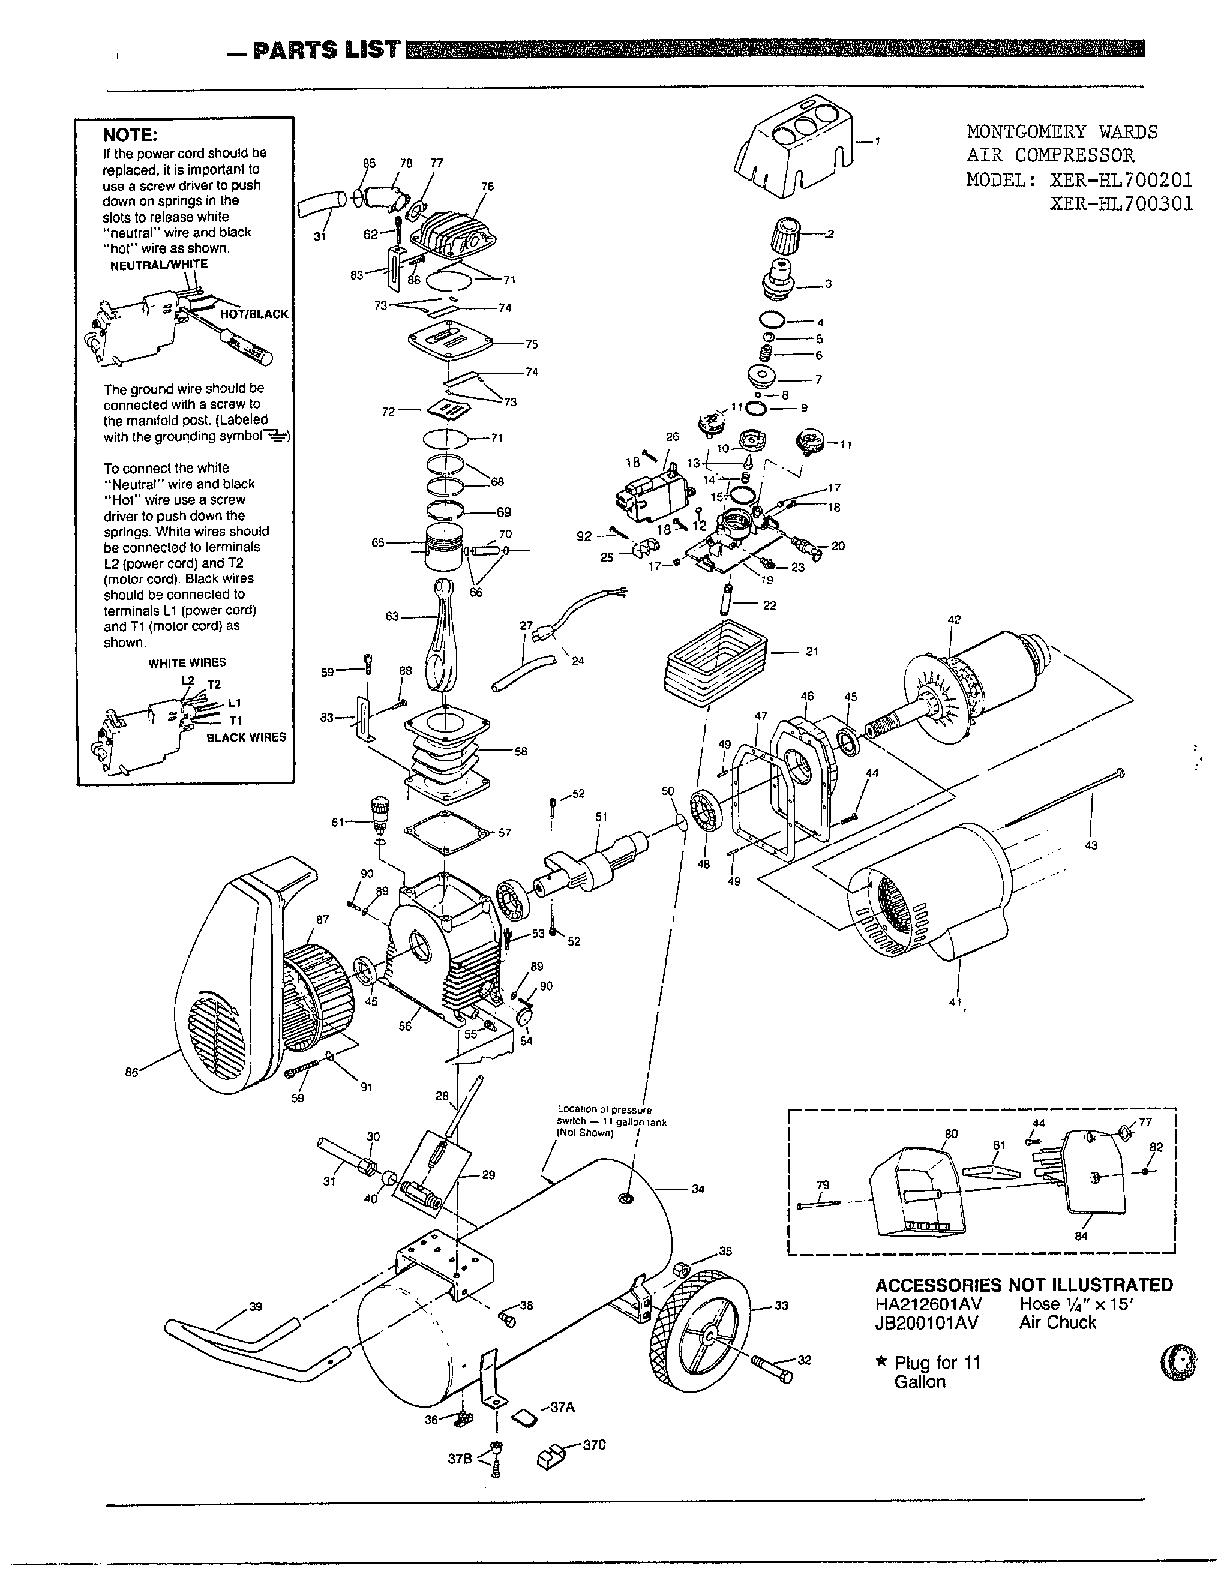 AIR COMPRESSOR Diagram & Parts List for Model hl700201